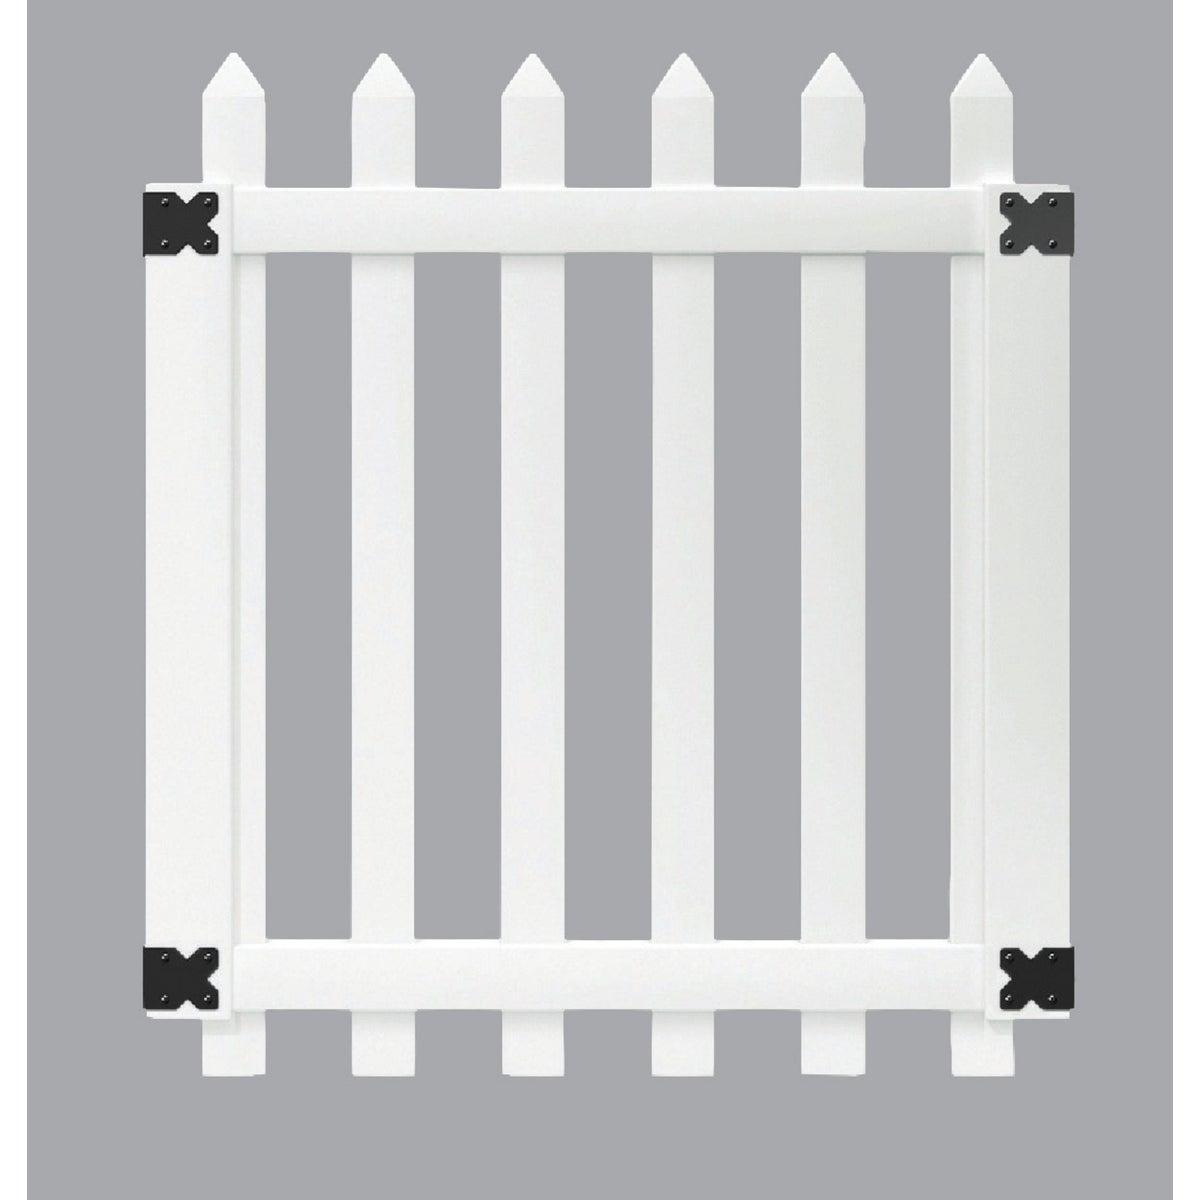 48X41.5 VNYL PICKET GATE - 116065 by Ufpi Lbr & Treated